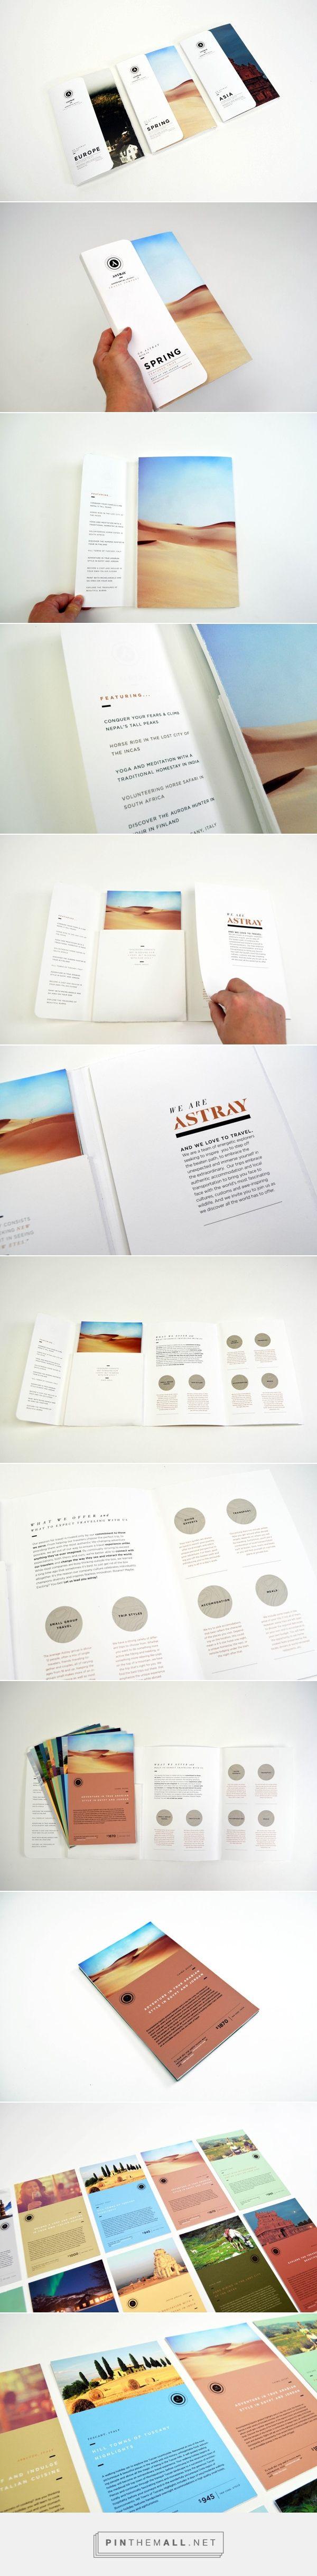 Astray Travel Co : Brochure Design on Behance - created via…